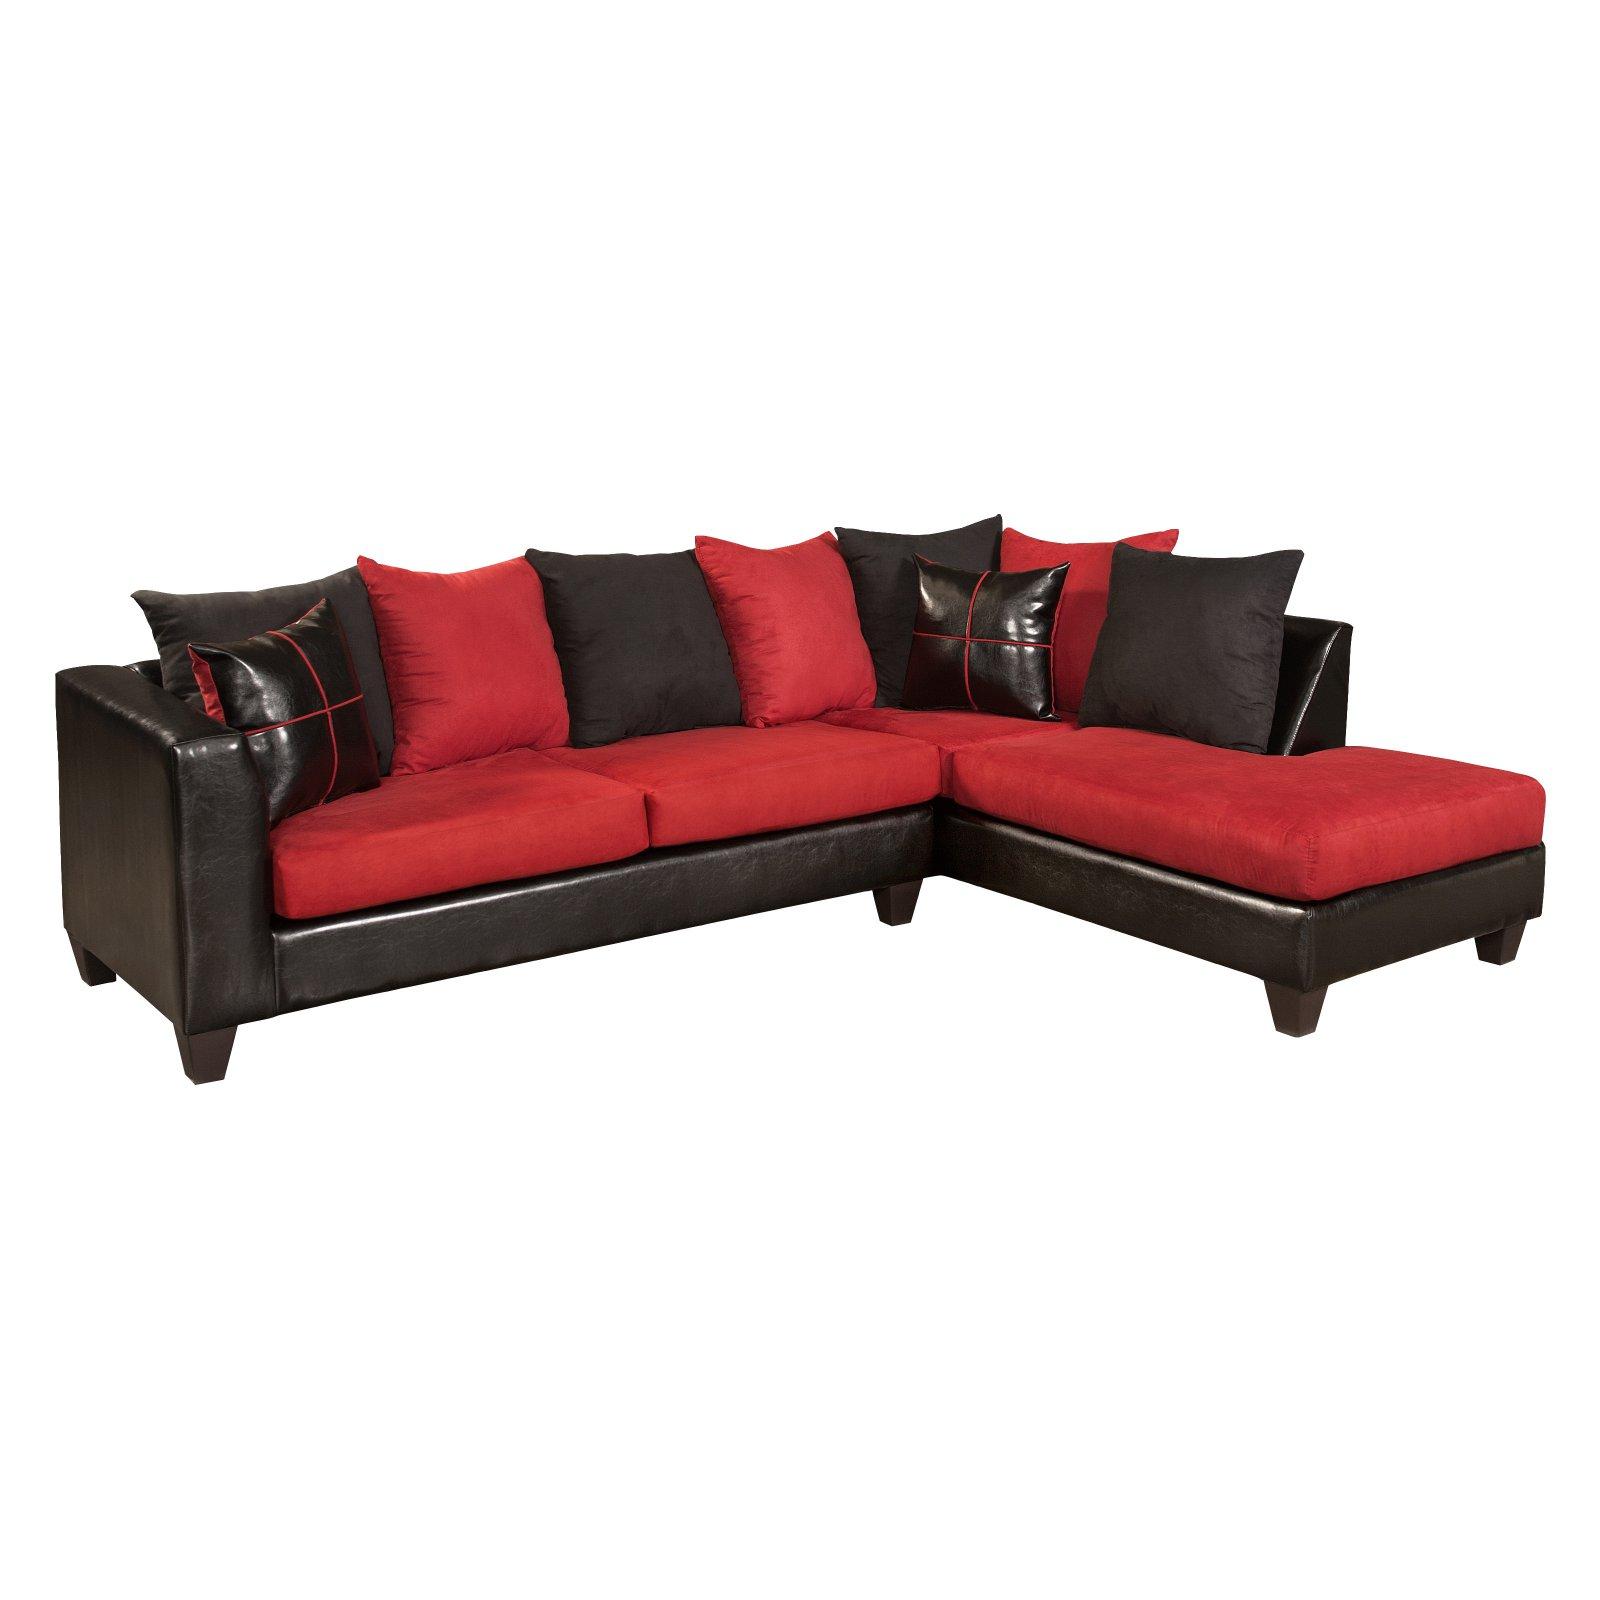 Flash Furniture Riverstone Victory Lane Cardinal Sectional Sofa